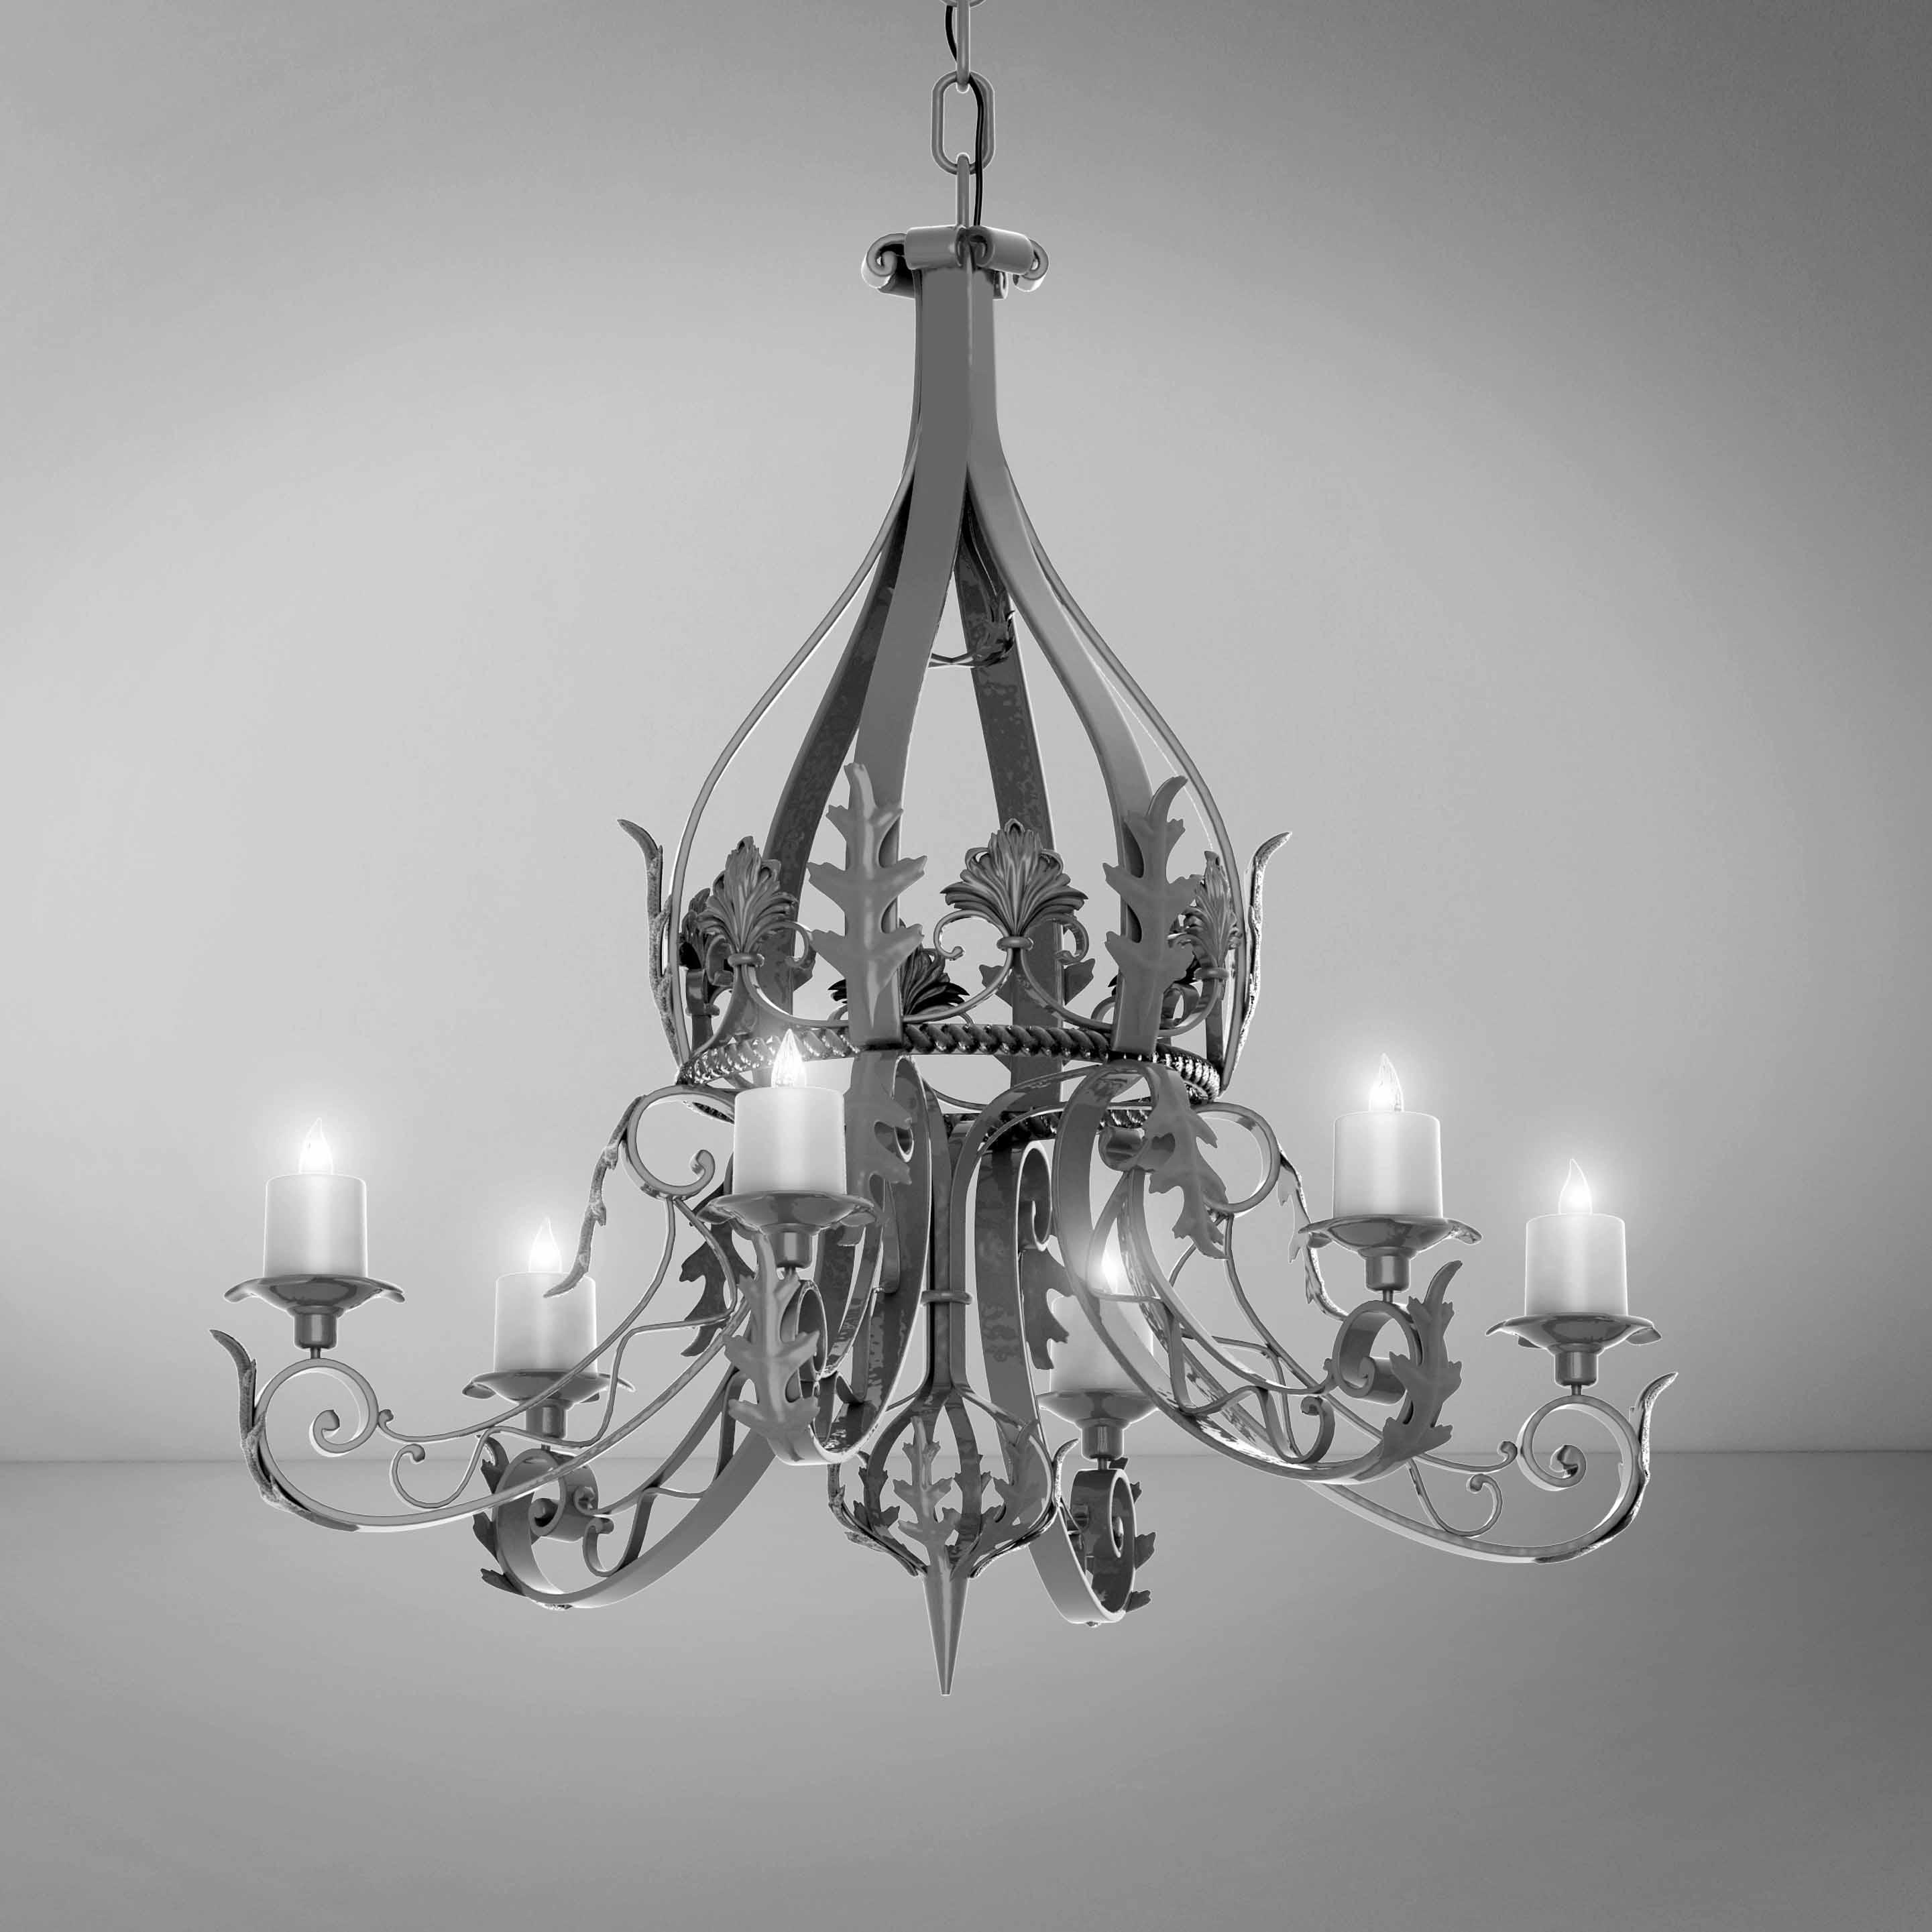 Elegant Luxury Silver Chandelier - 3D Product